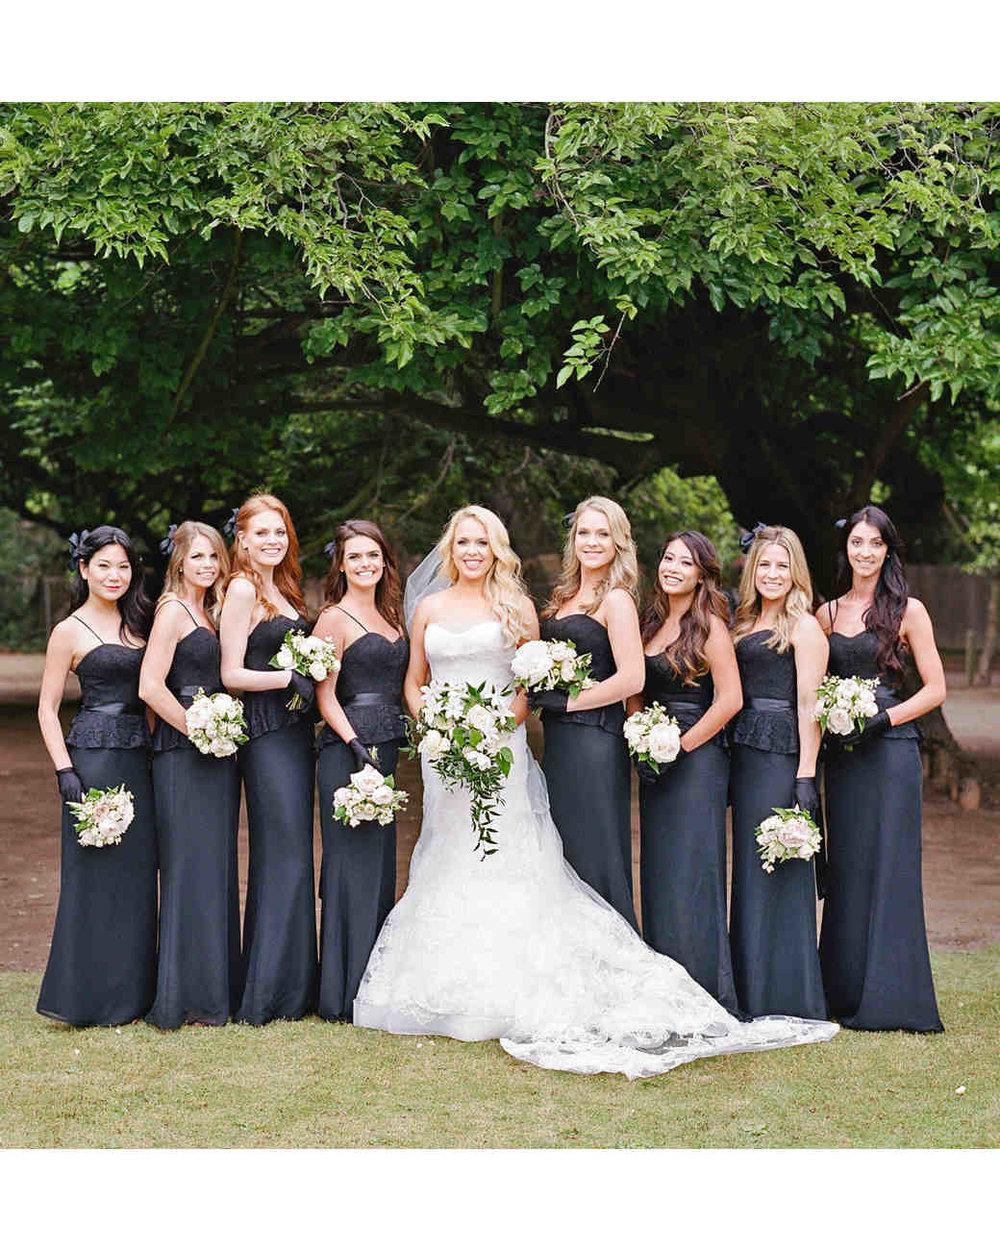 shannon-jon-wedding-bridesmaids-0143-6238579-0117_vert.jpg